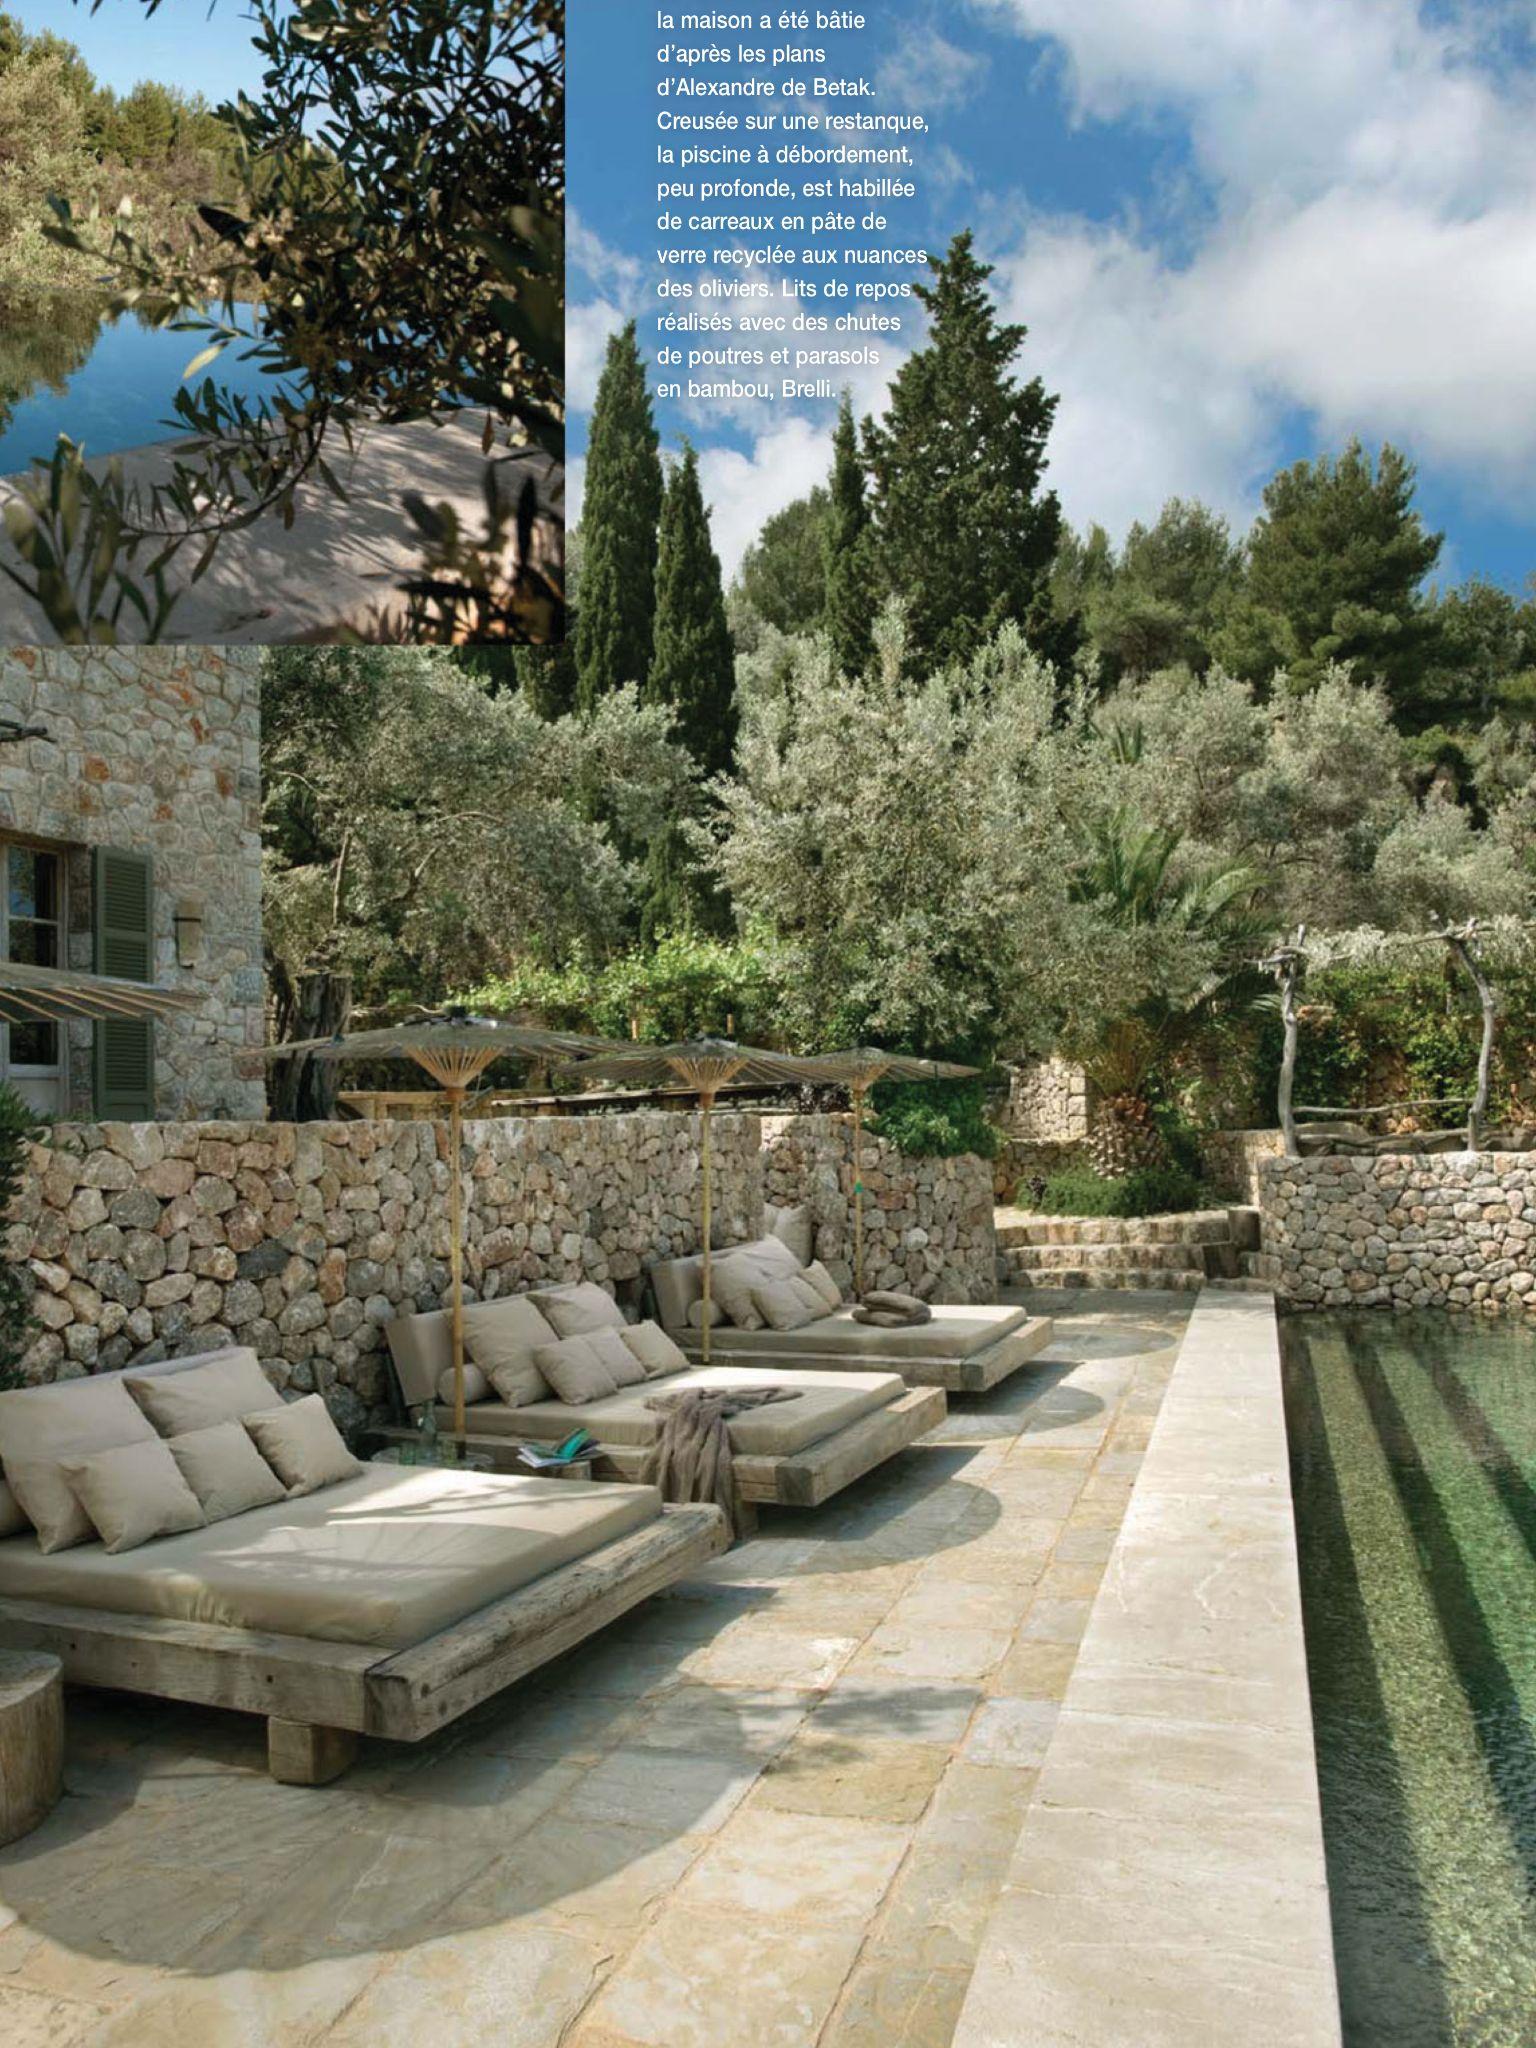 Epingle Par Felipe Gonzalez Jimenez De La Sur Outdoor Living Piscine Et Jardin Amenagement Jardin Terrasse Jardin